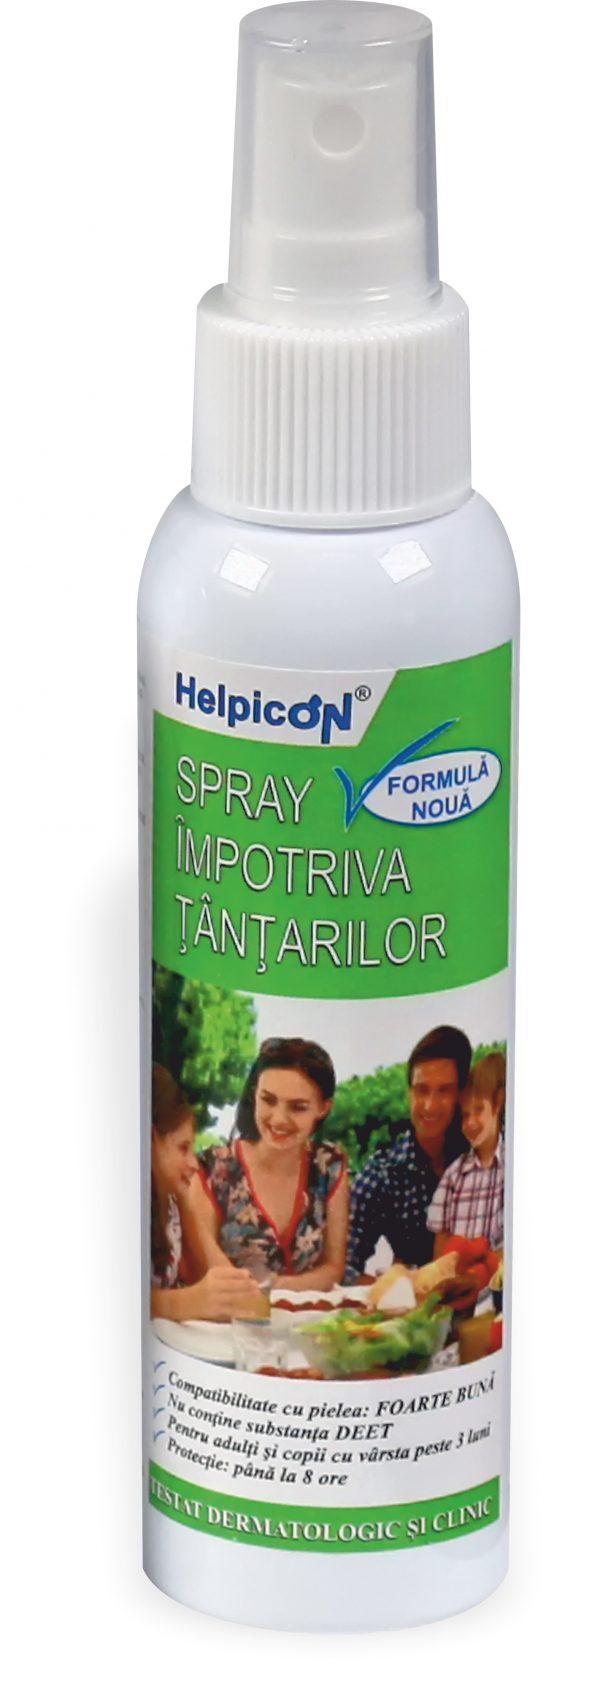 HelpicOn spray impotriva intepaturilor de tantari 100ml